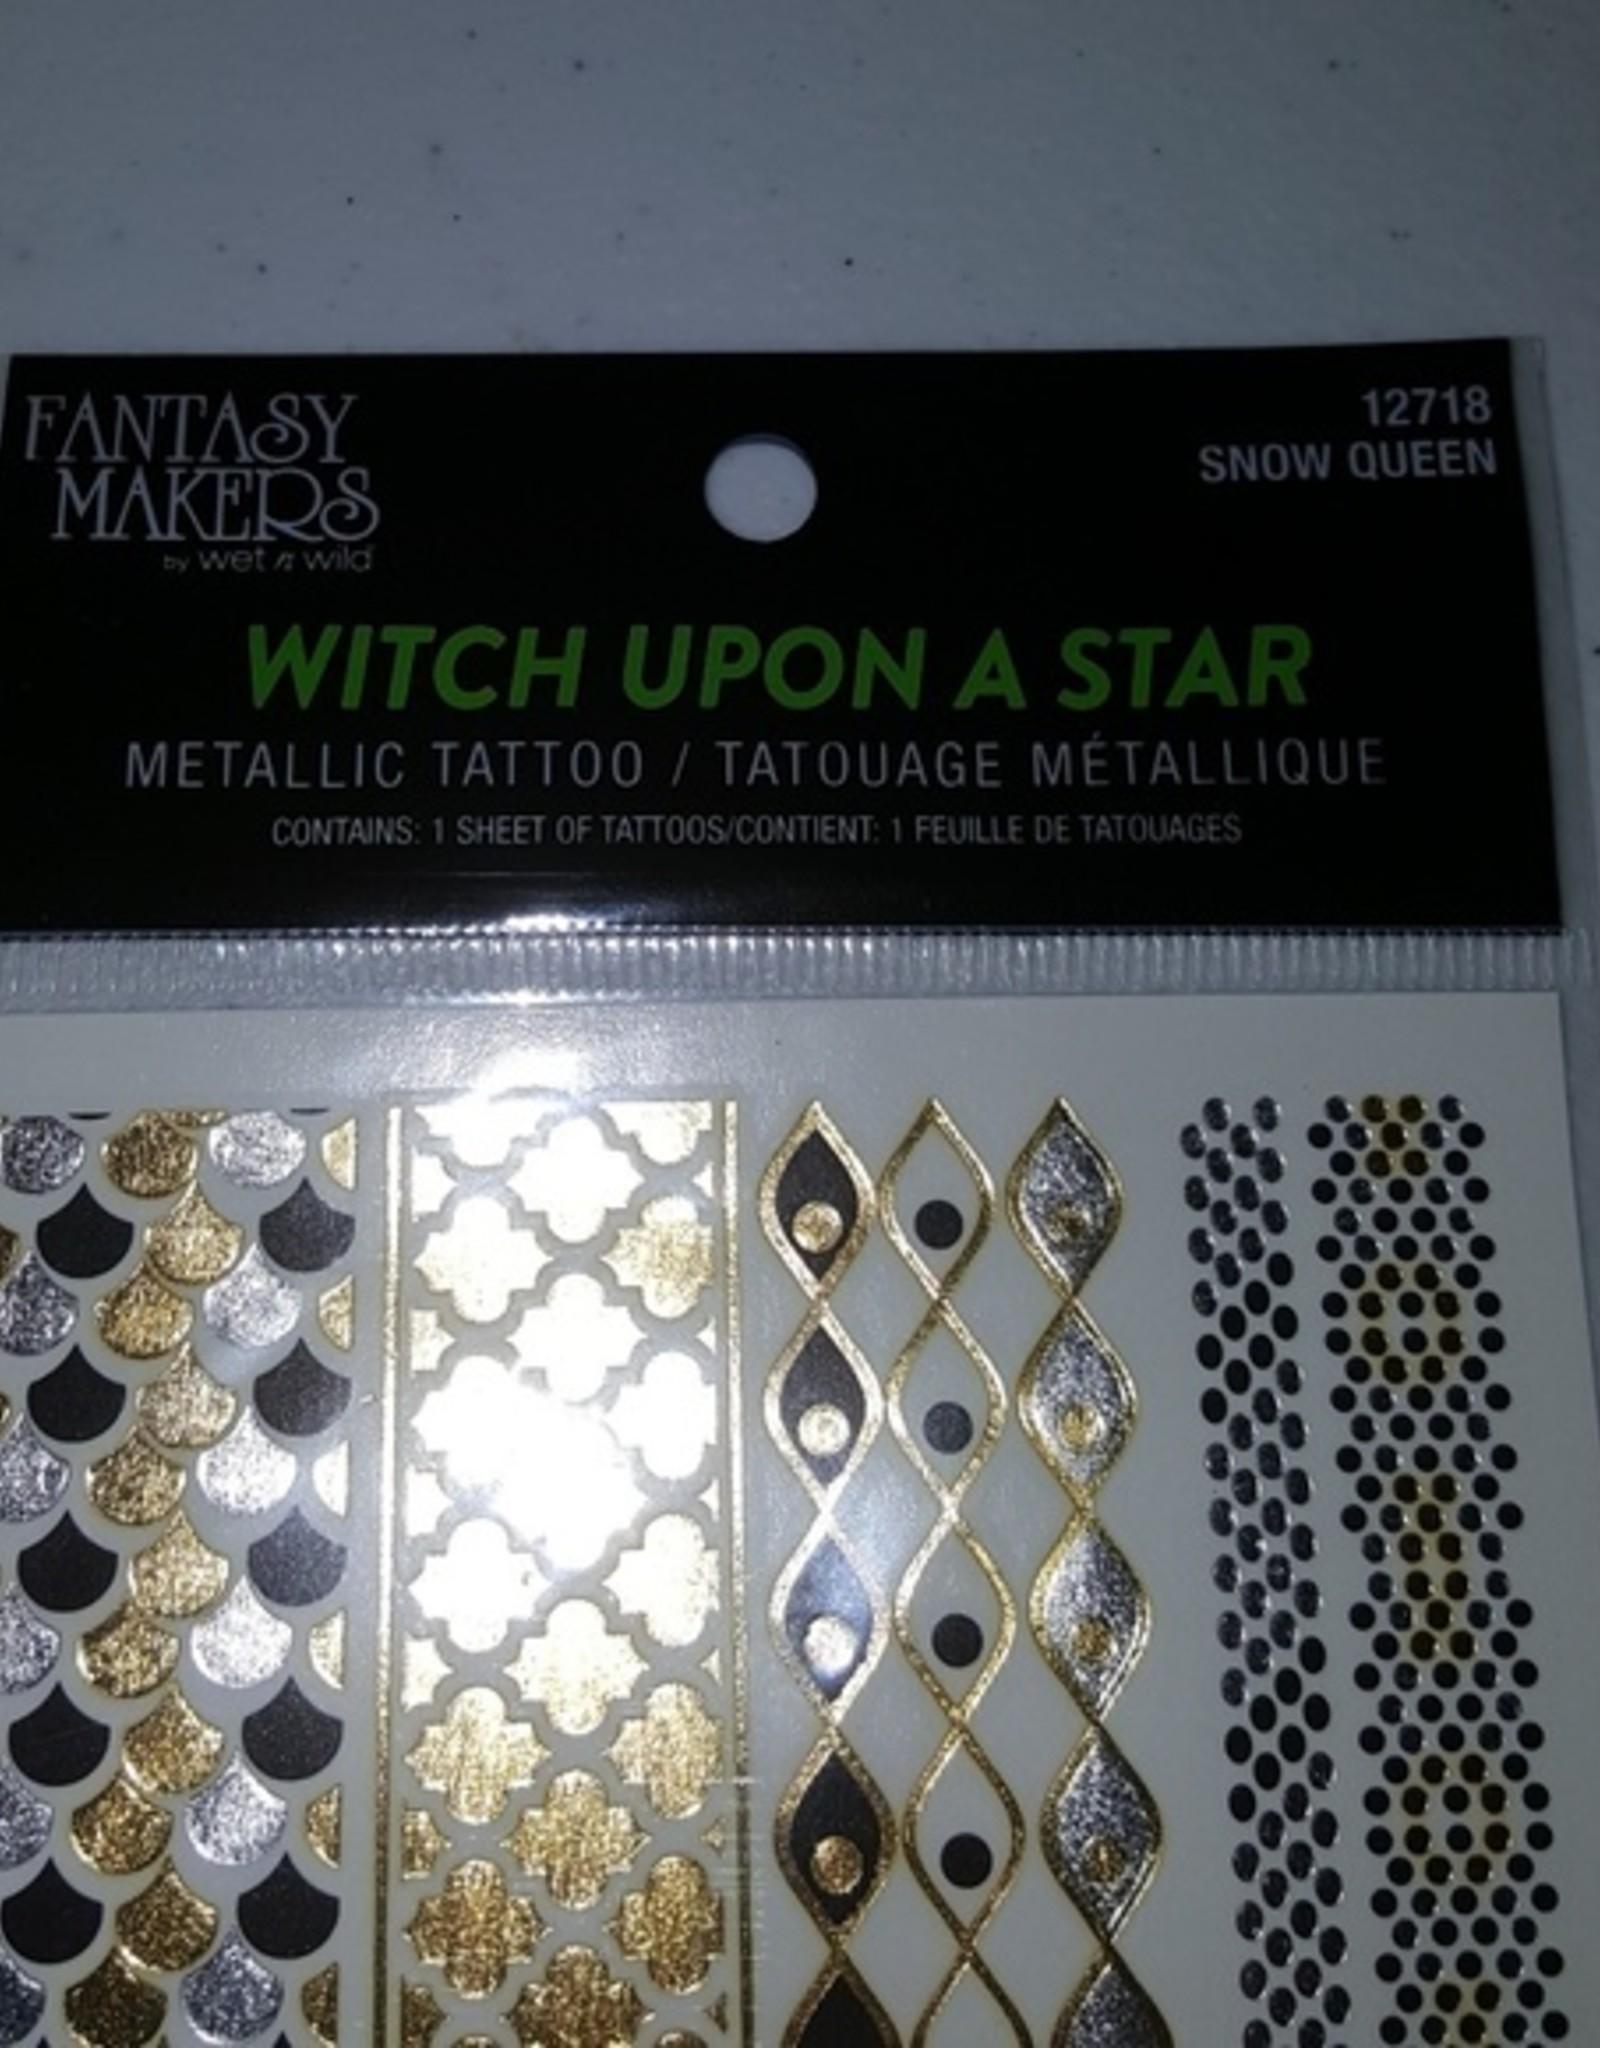 Snow Queen Metallic Temporary Tattoo